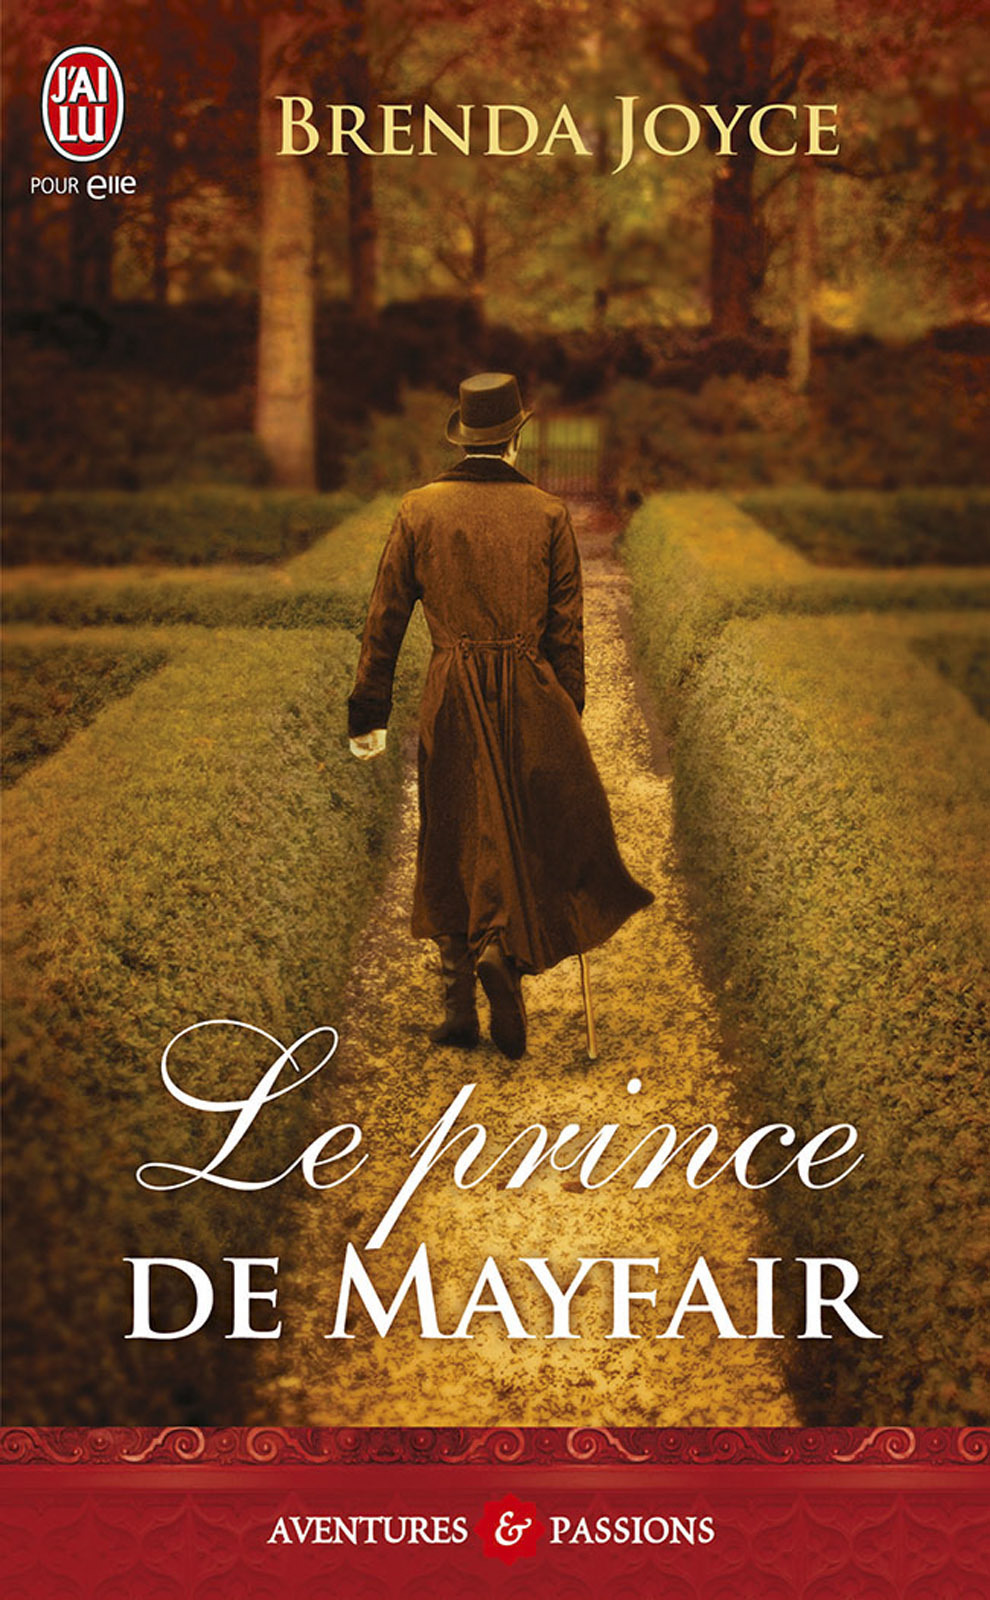 Le prince de Mayfair